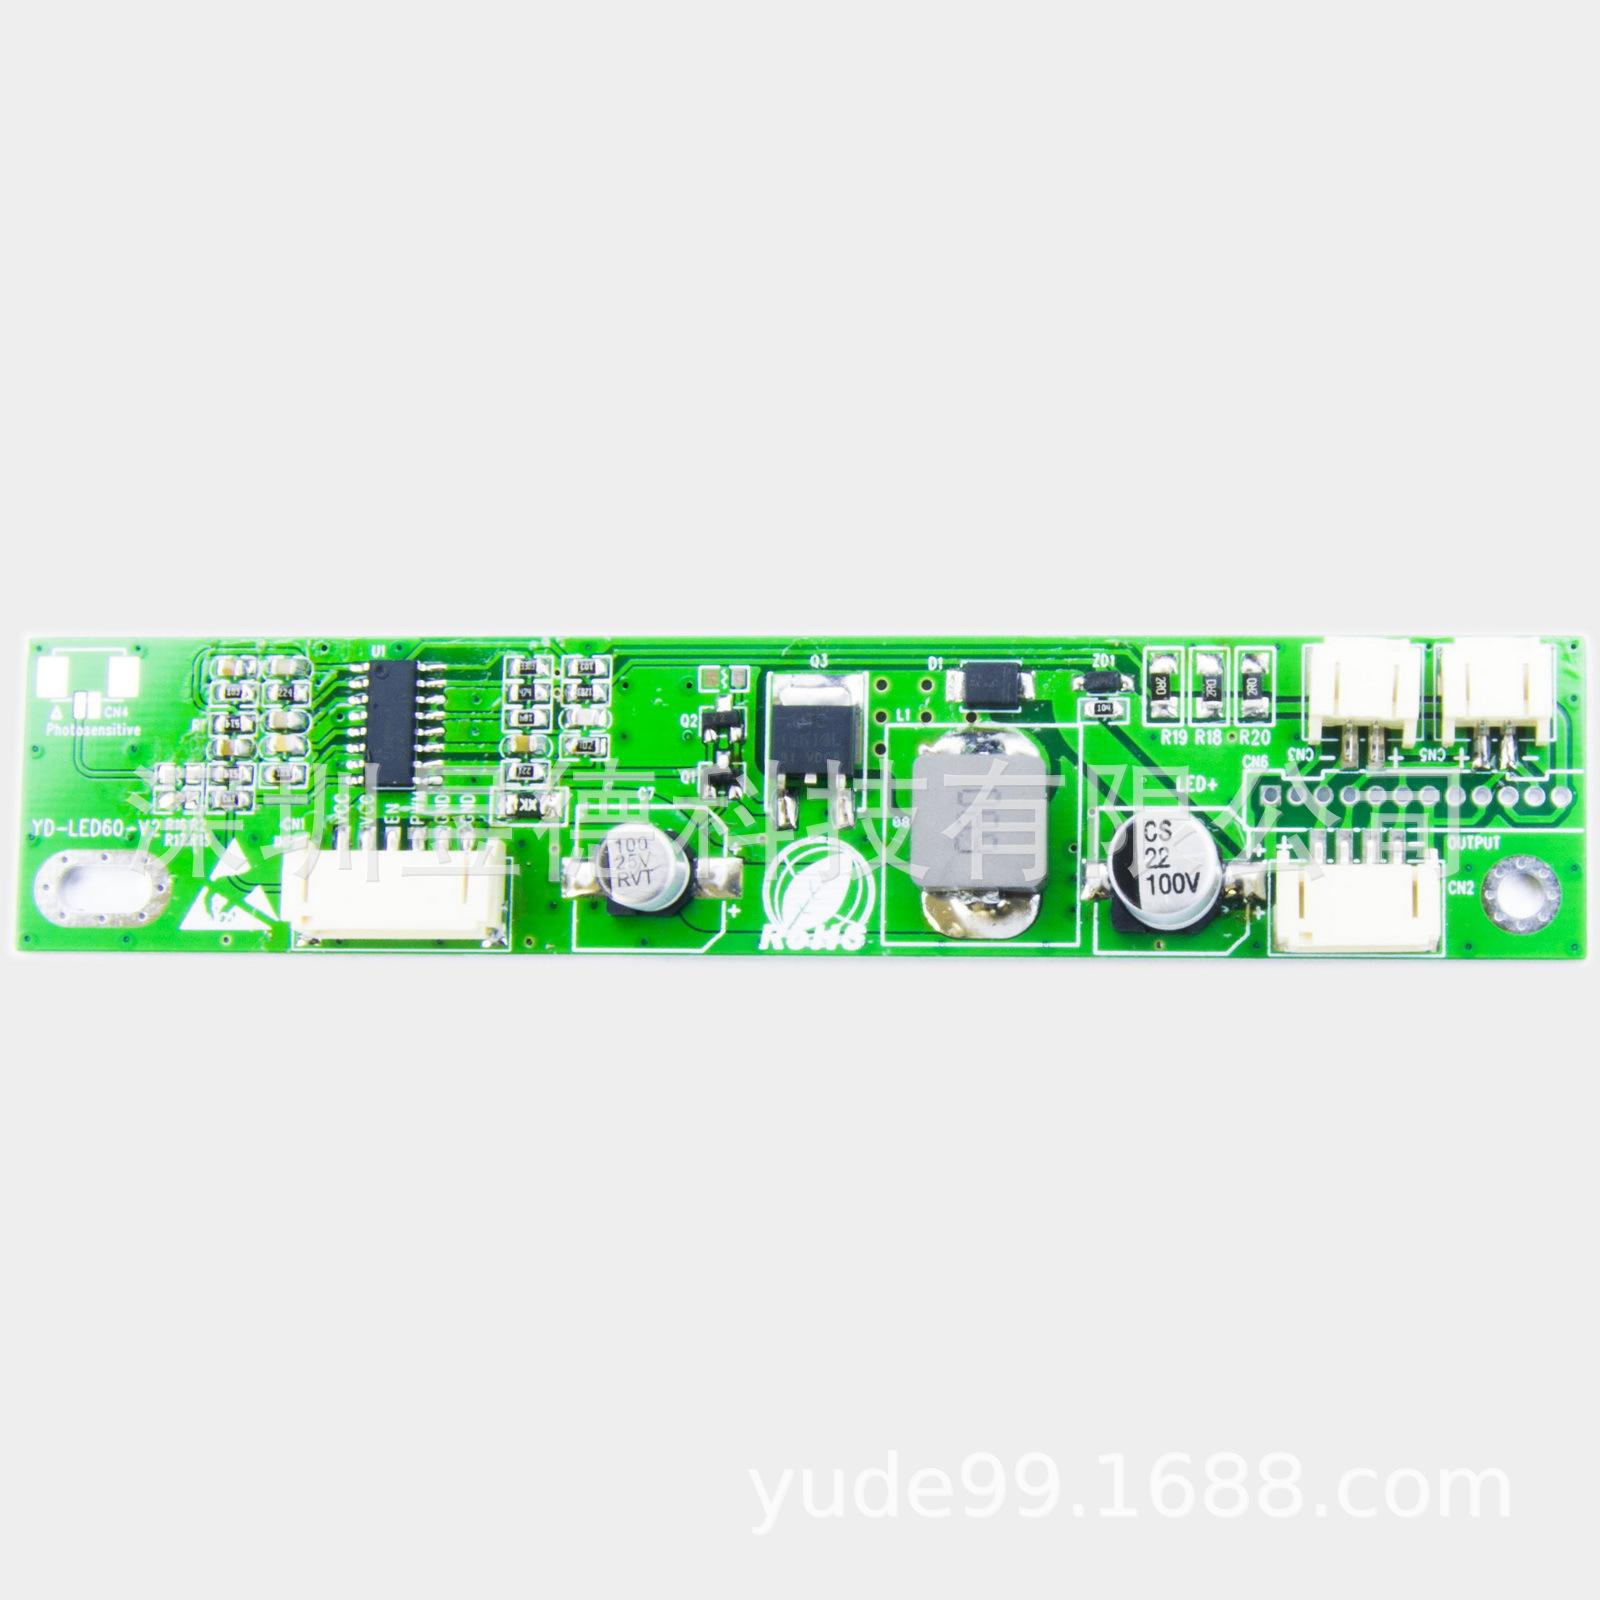 LCD升压板,LED升压板,背光板,高压板,工业级,